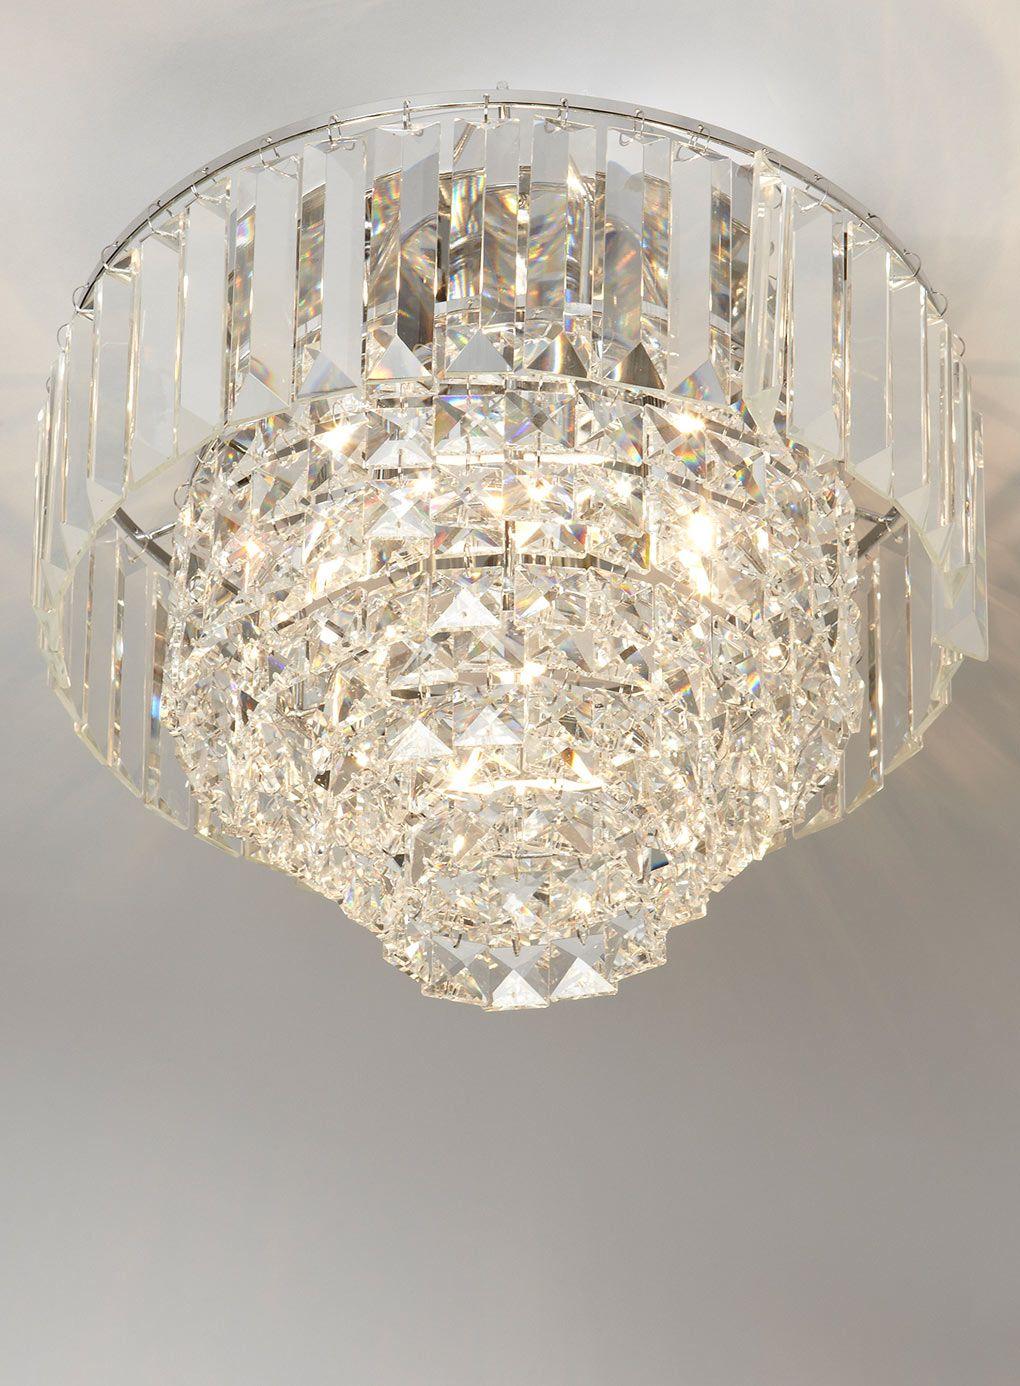 Bedroom Ceiling Lights Bhs : Chrome paladina crystal flush ceiling lights lighting